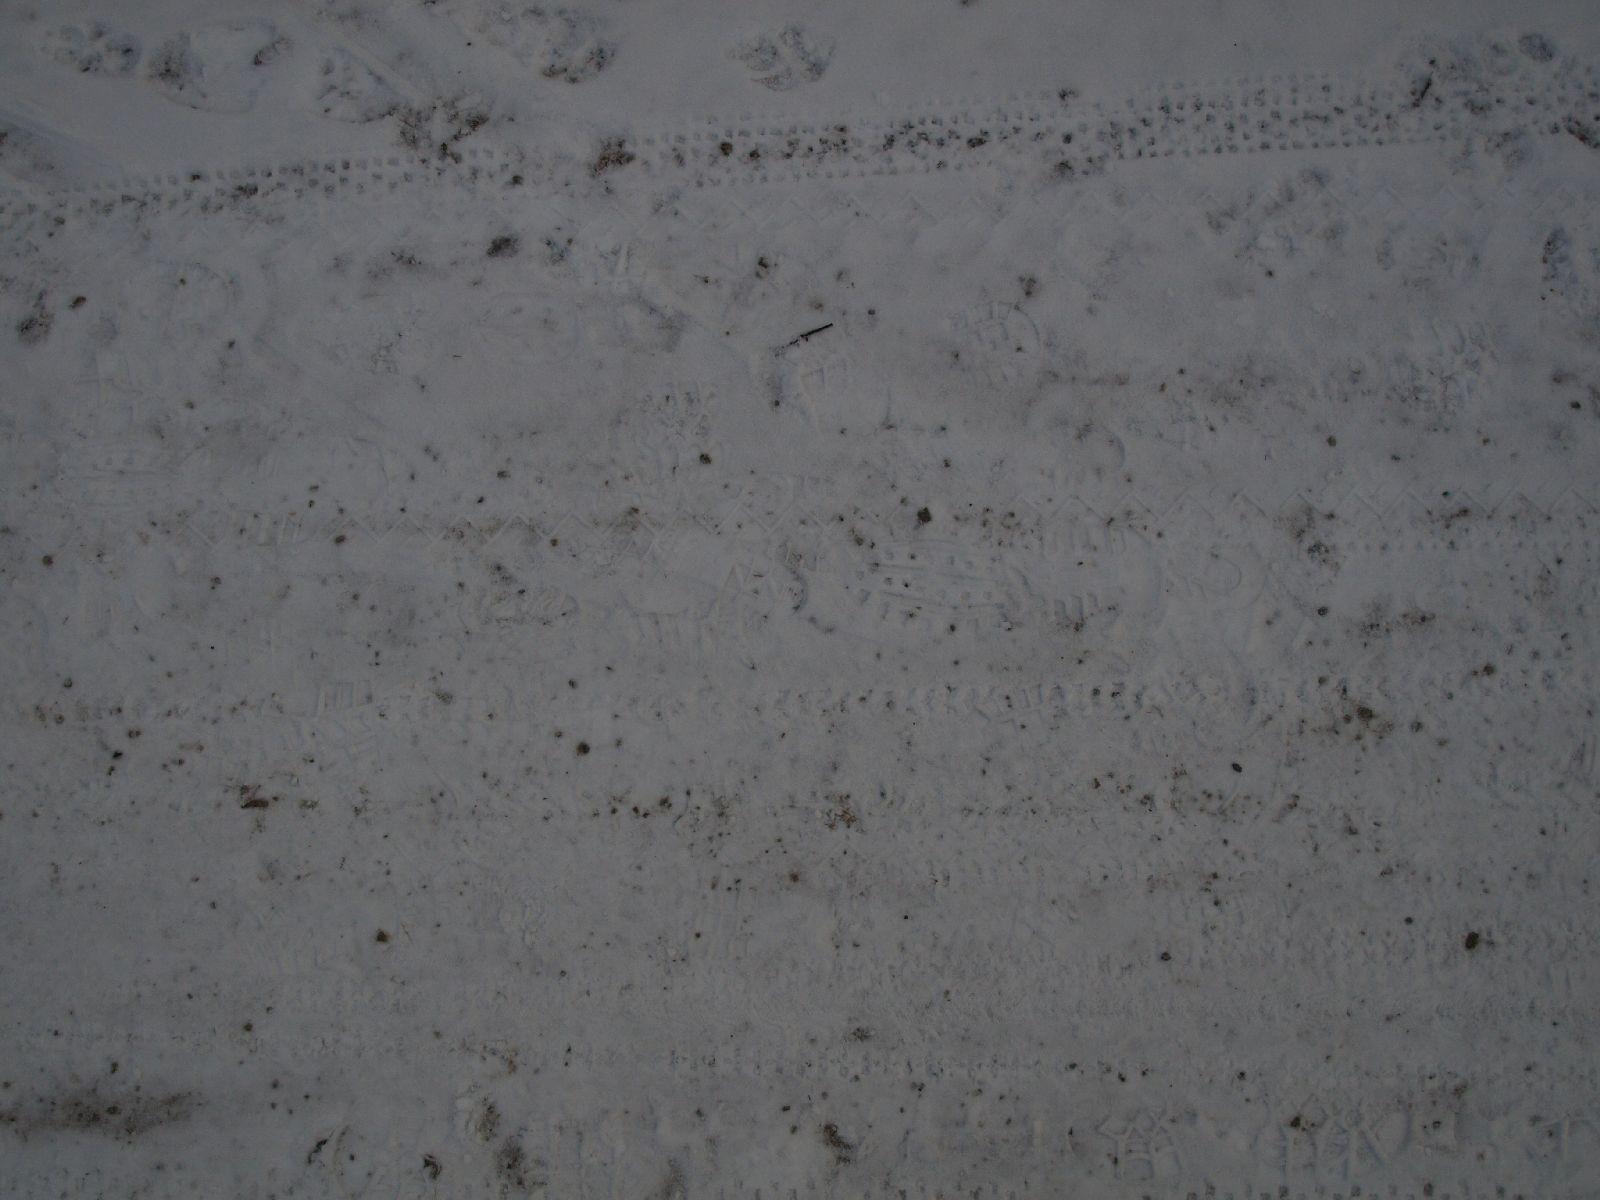 Snow_Texture_A_P1038771